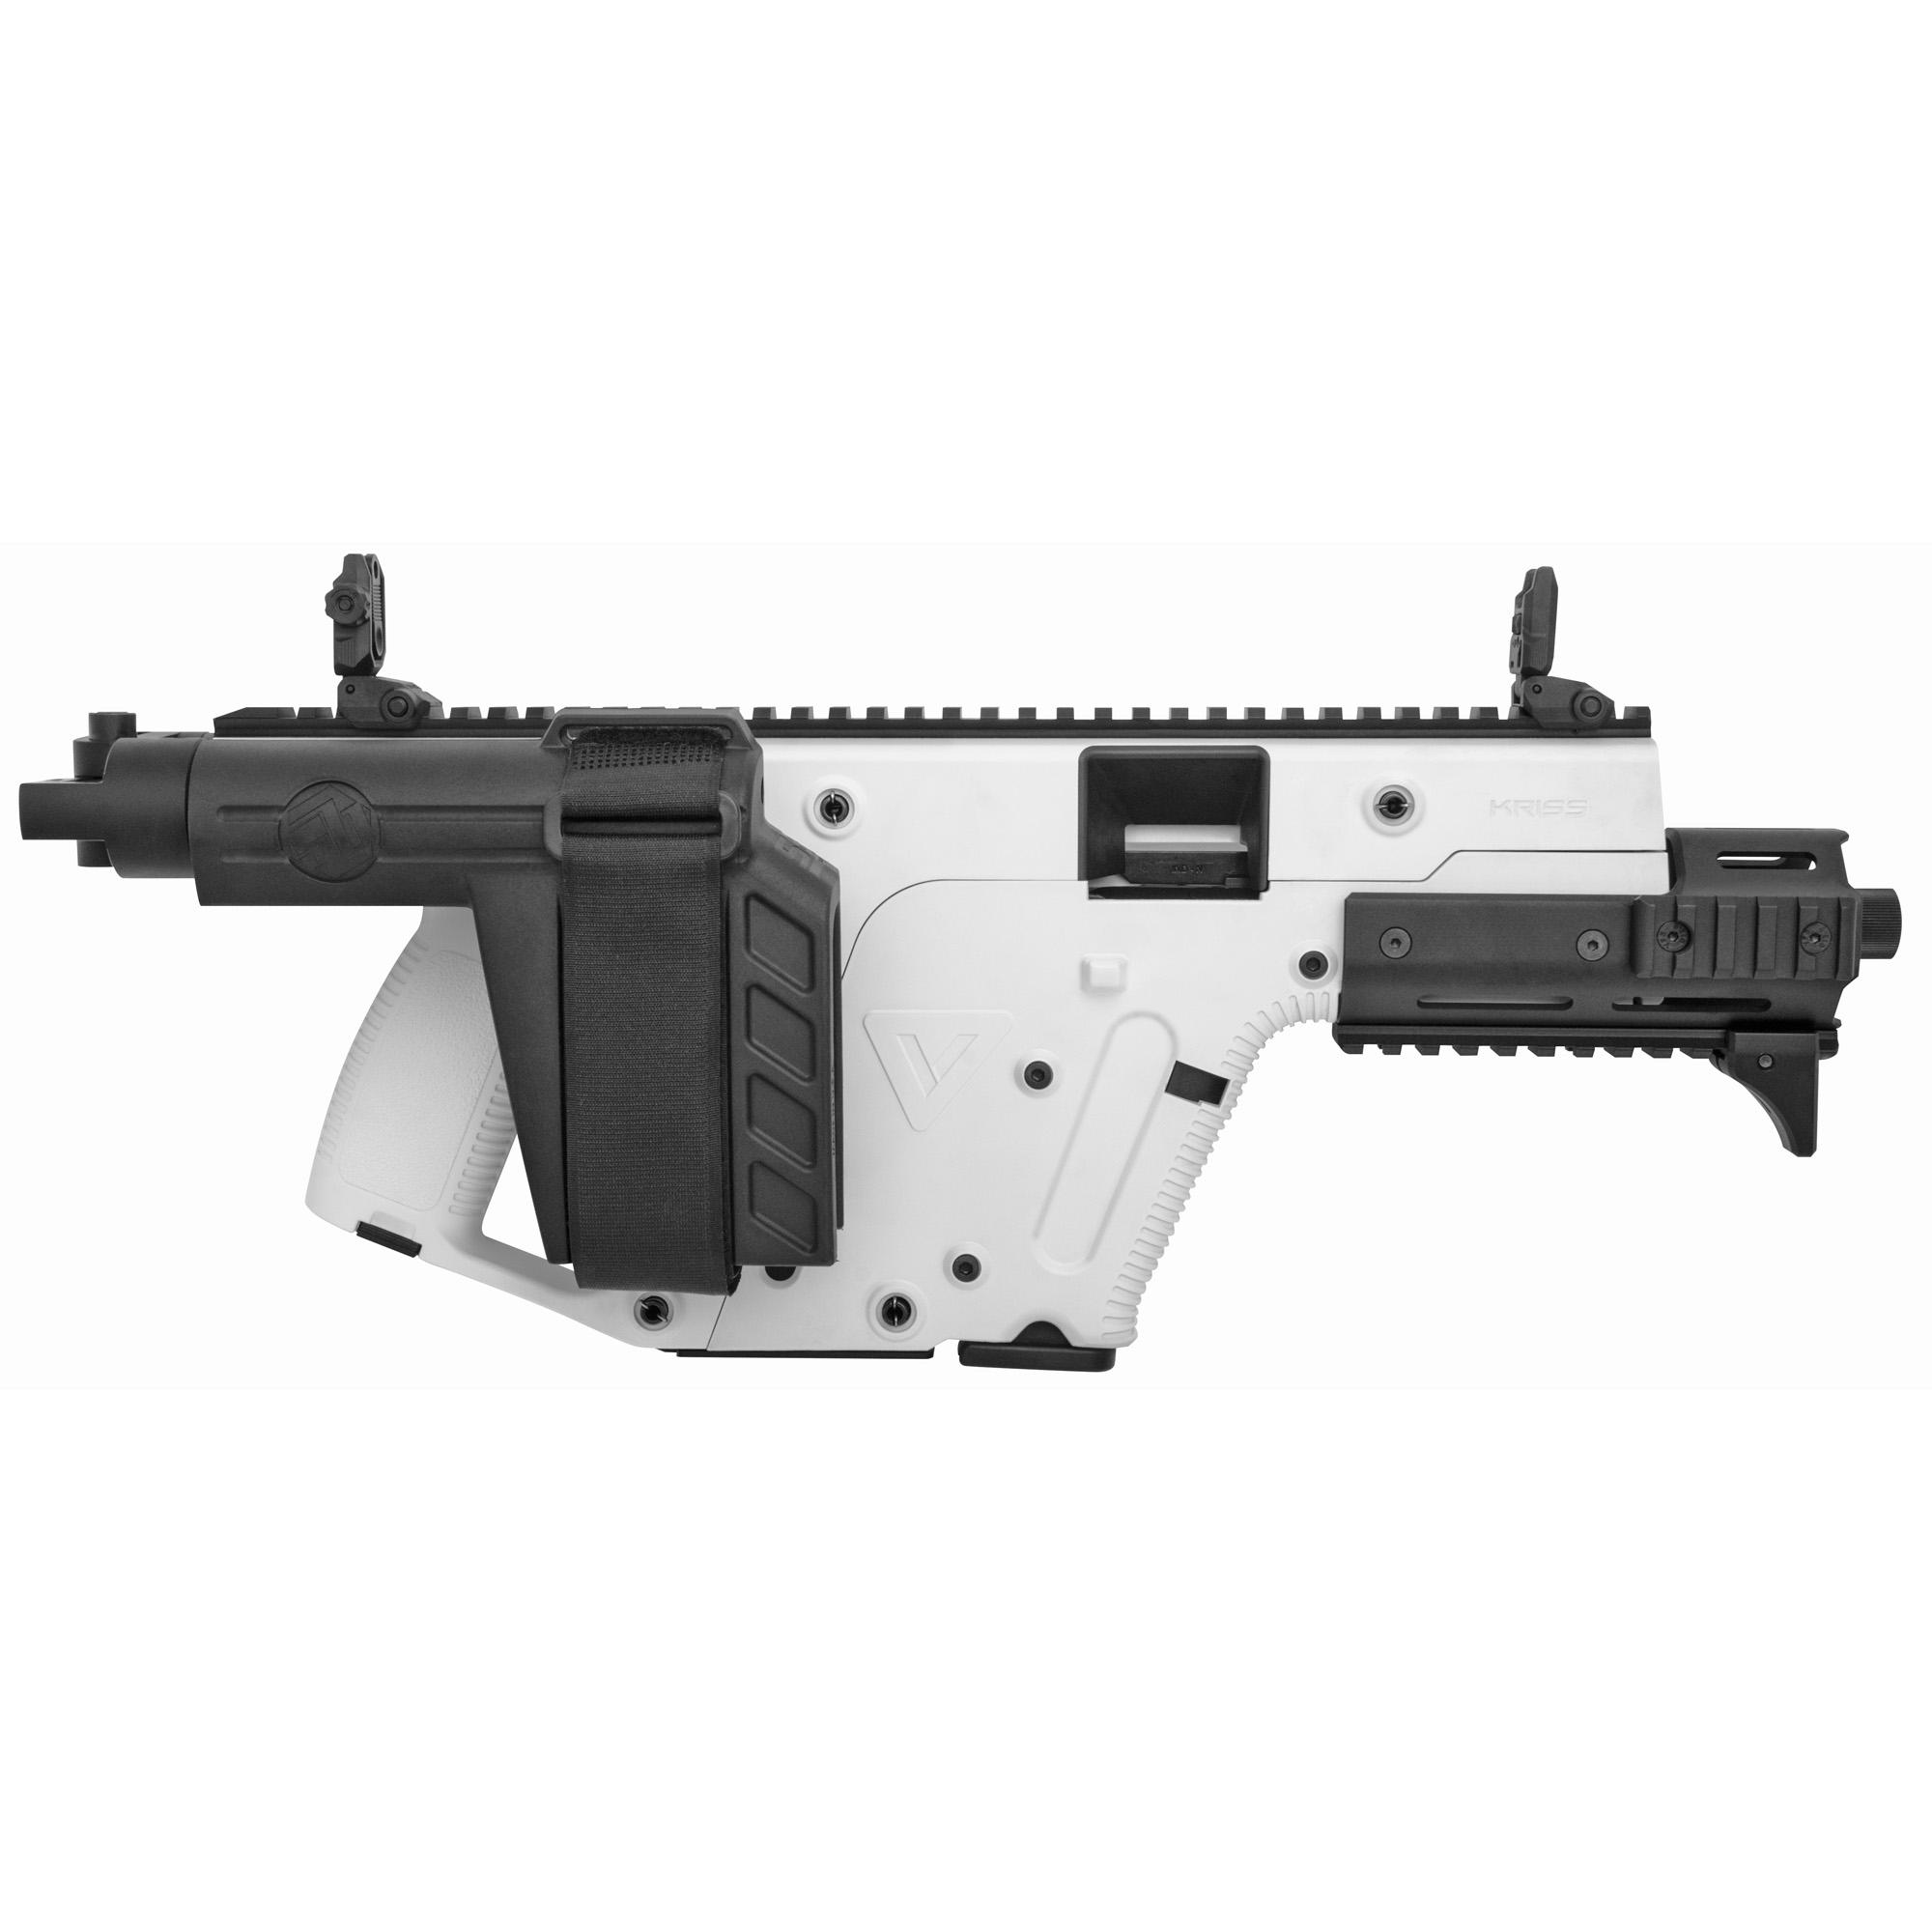 "Kriss Vector Sdp Sbxk 10mm 6.5"" Alp-KRKV10-PSBAP31"